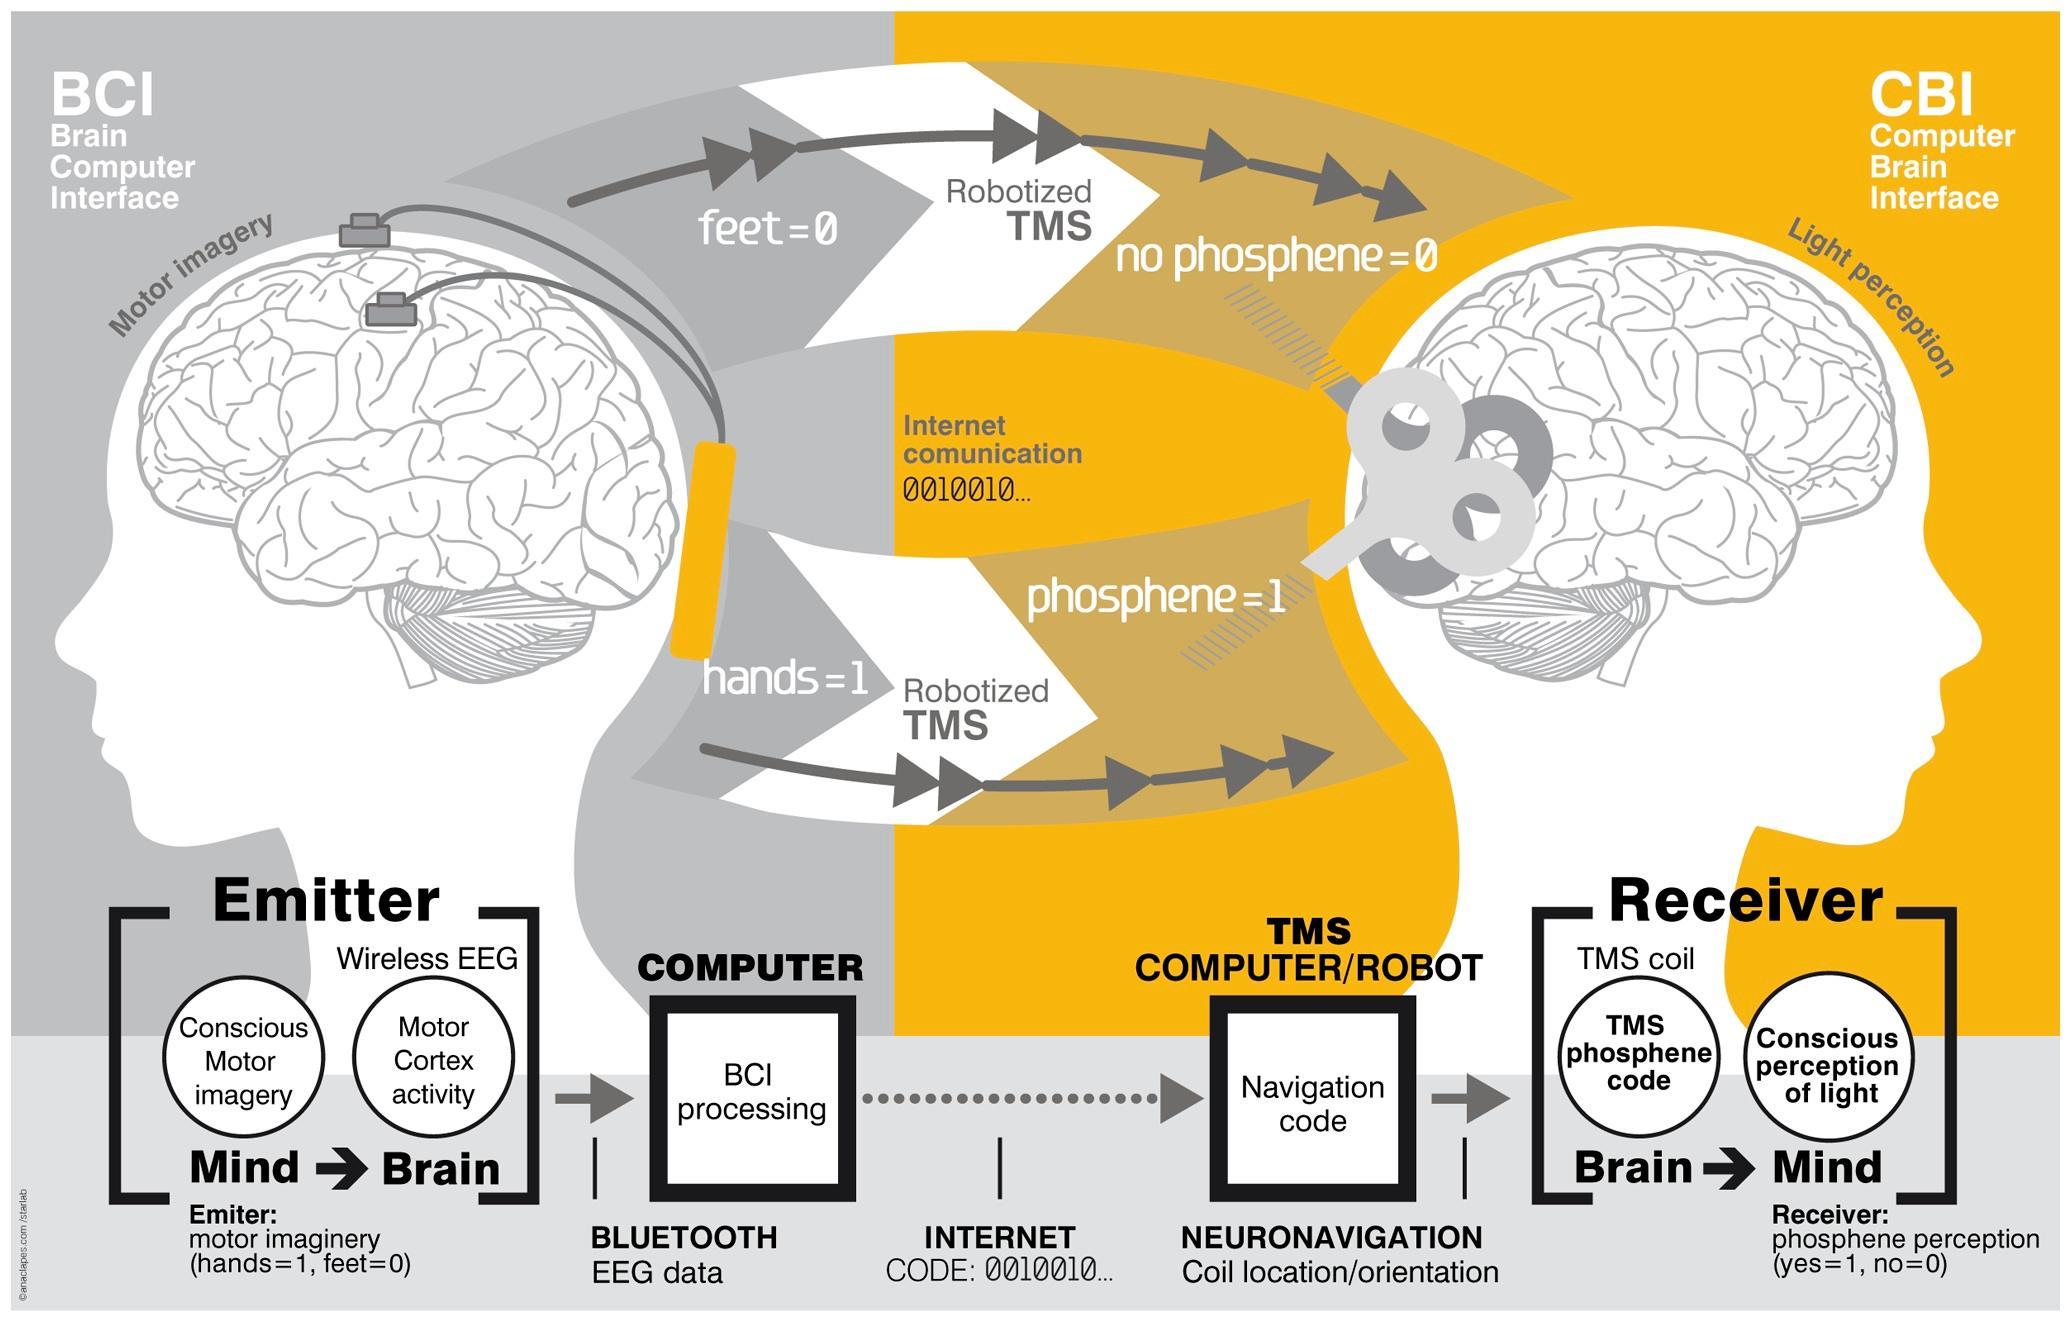 How Brain-to-Brain Communication Works